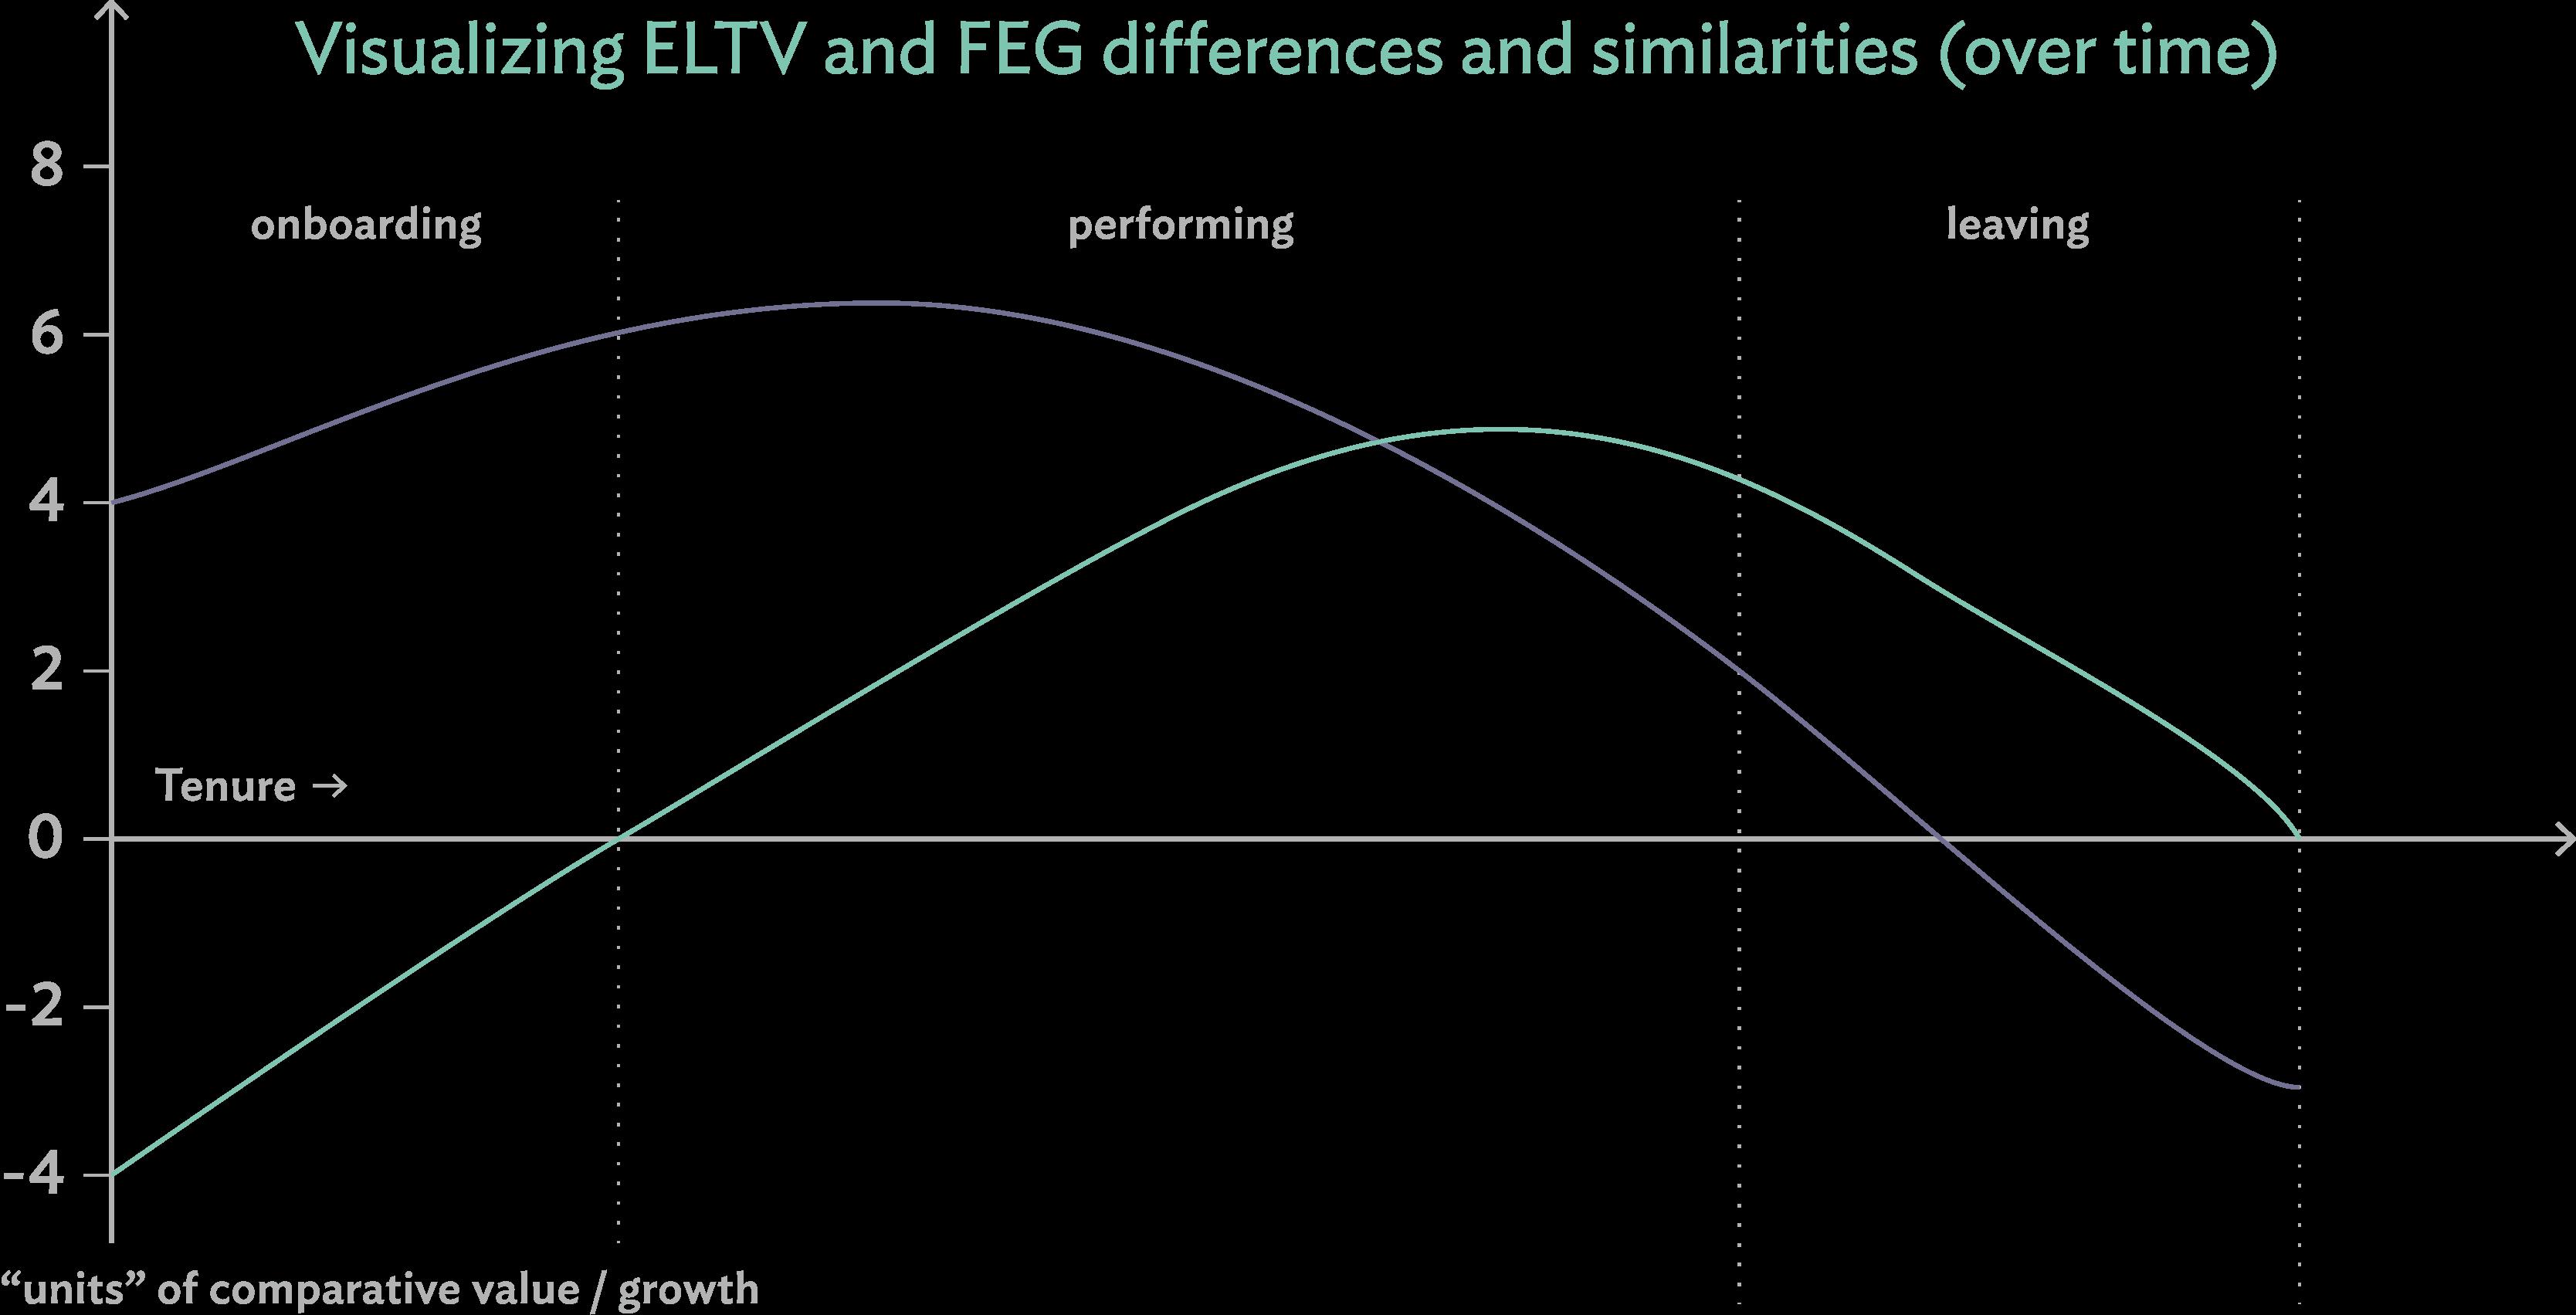 Visualizing ELTV & FEG | Culture Amp